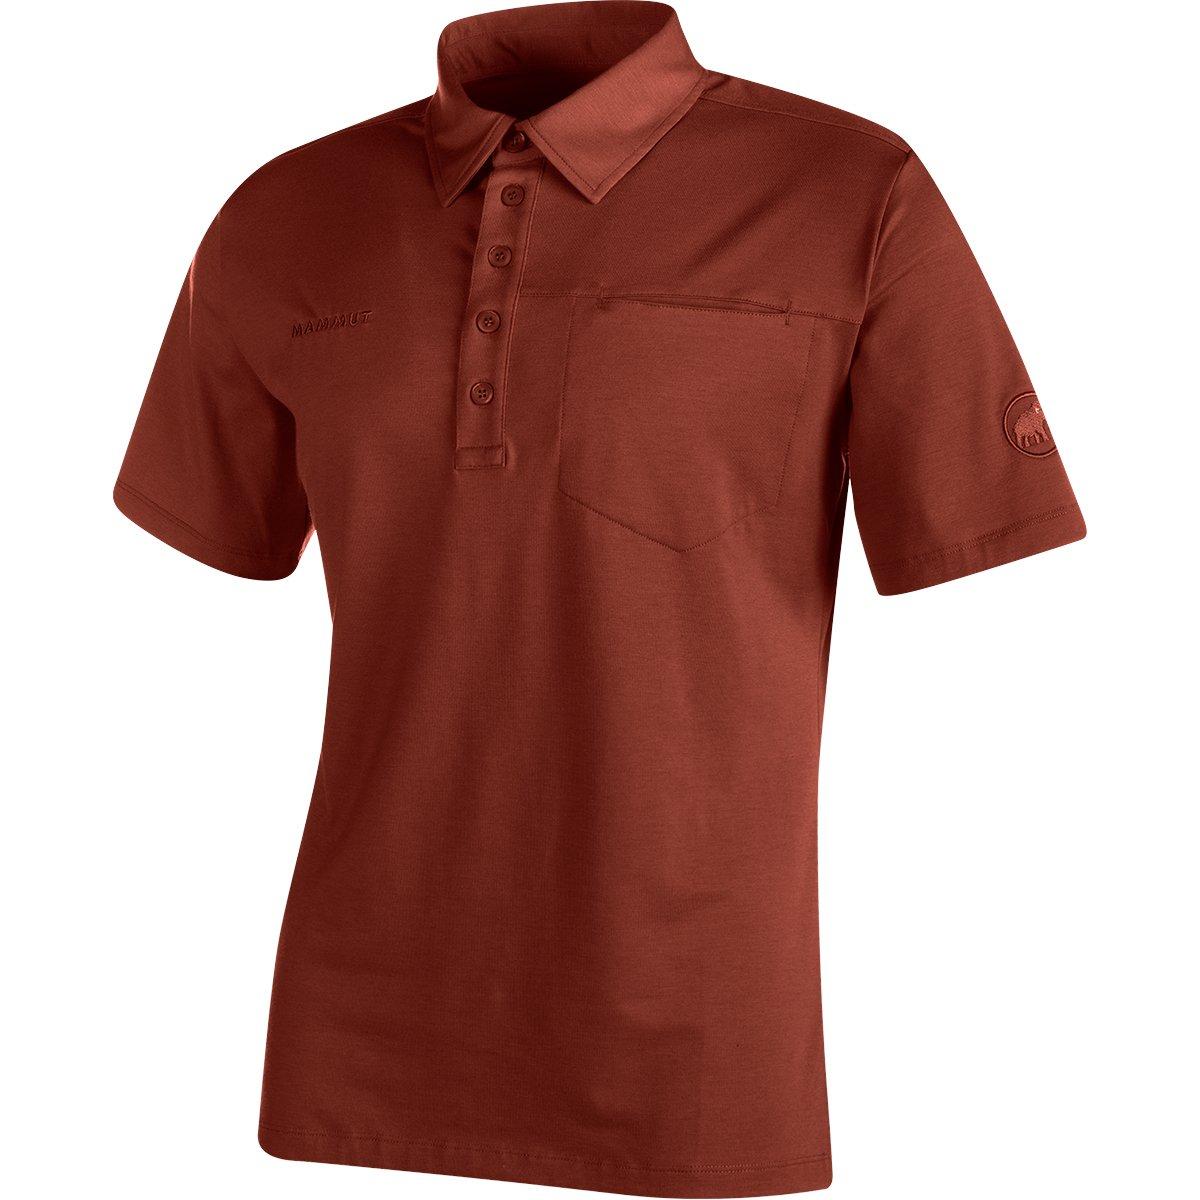 Mammut Trovat Tour Camiseta Polo Men - Tiempo Libre y de Viaje ...